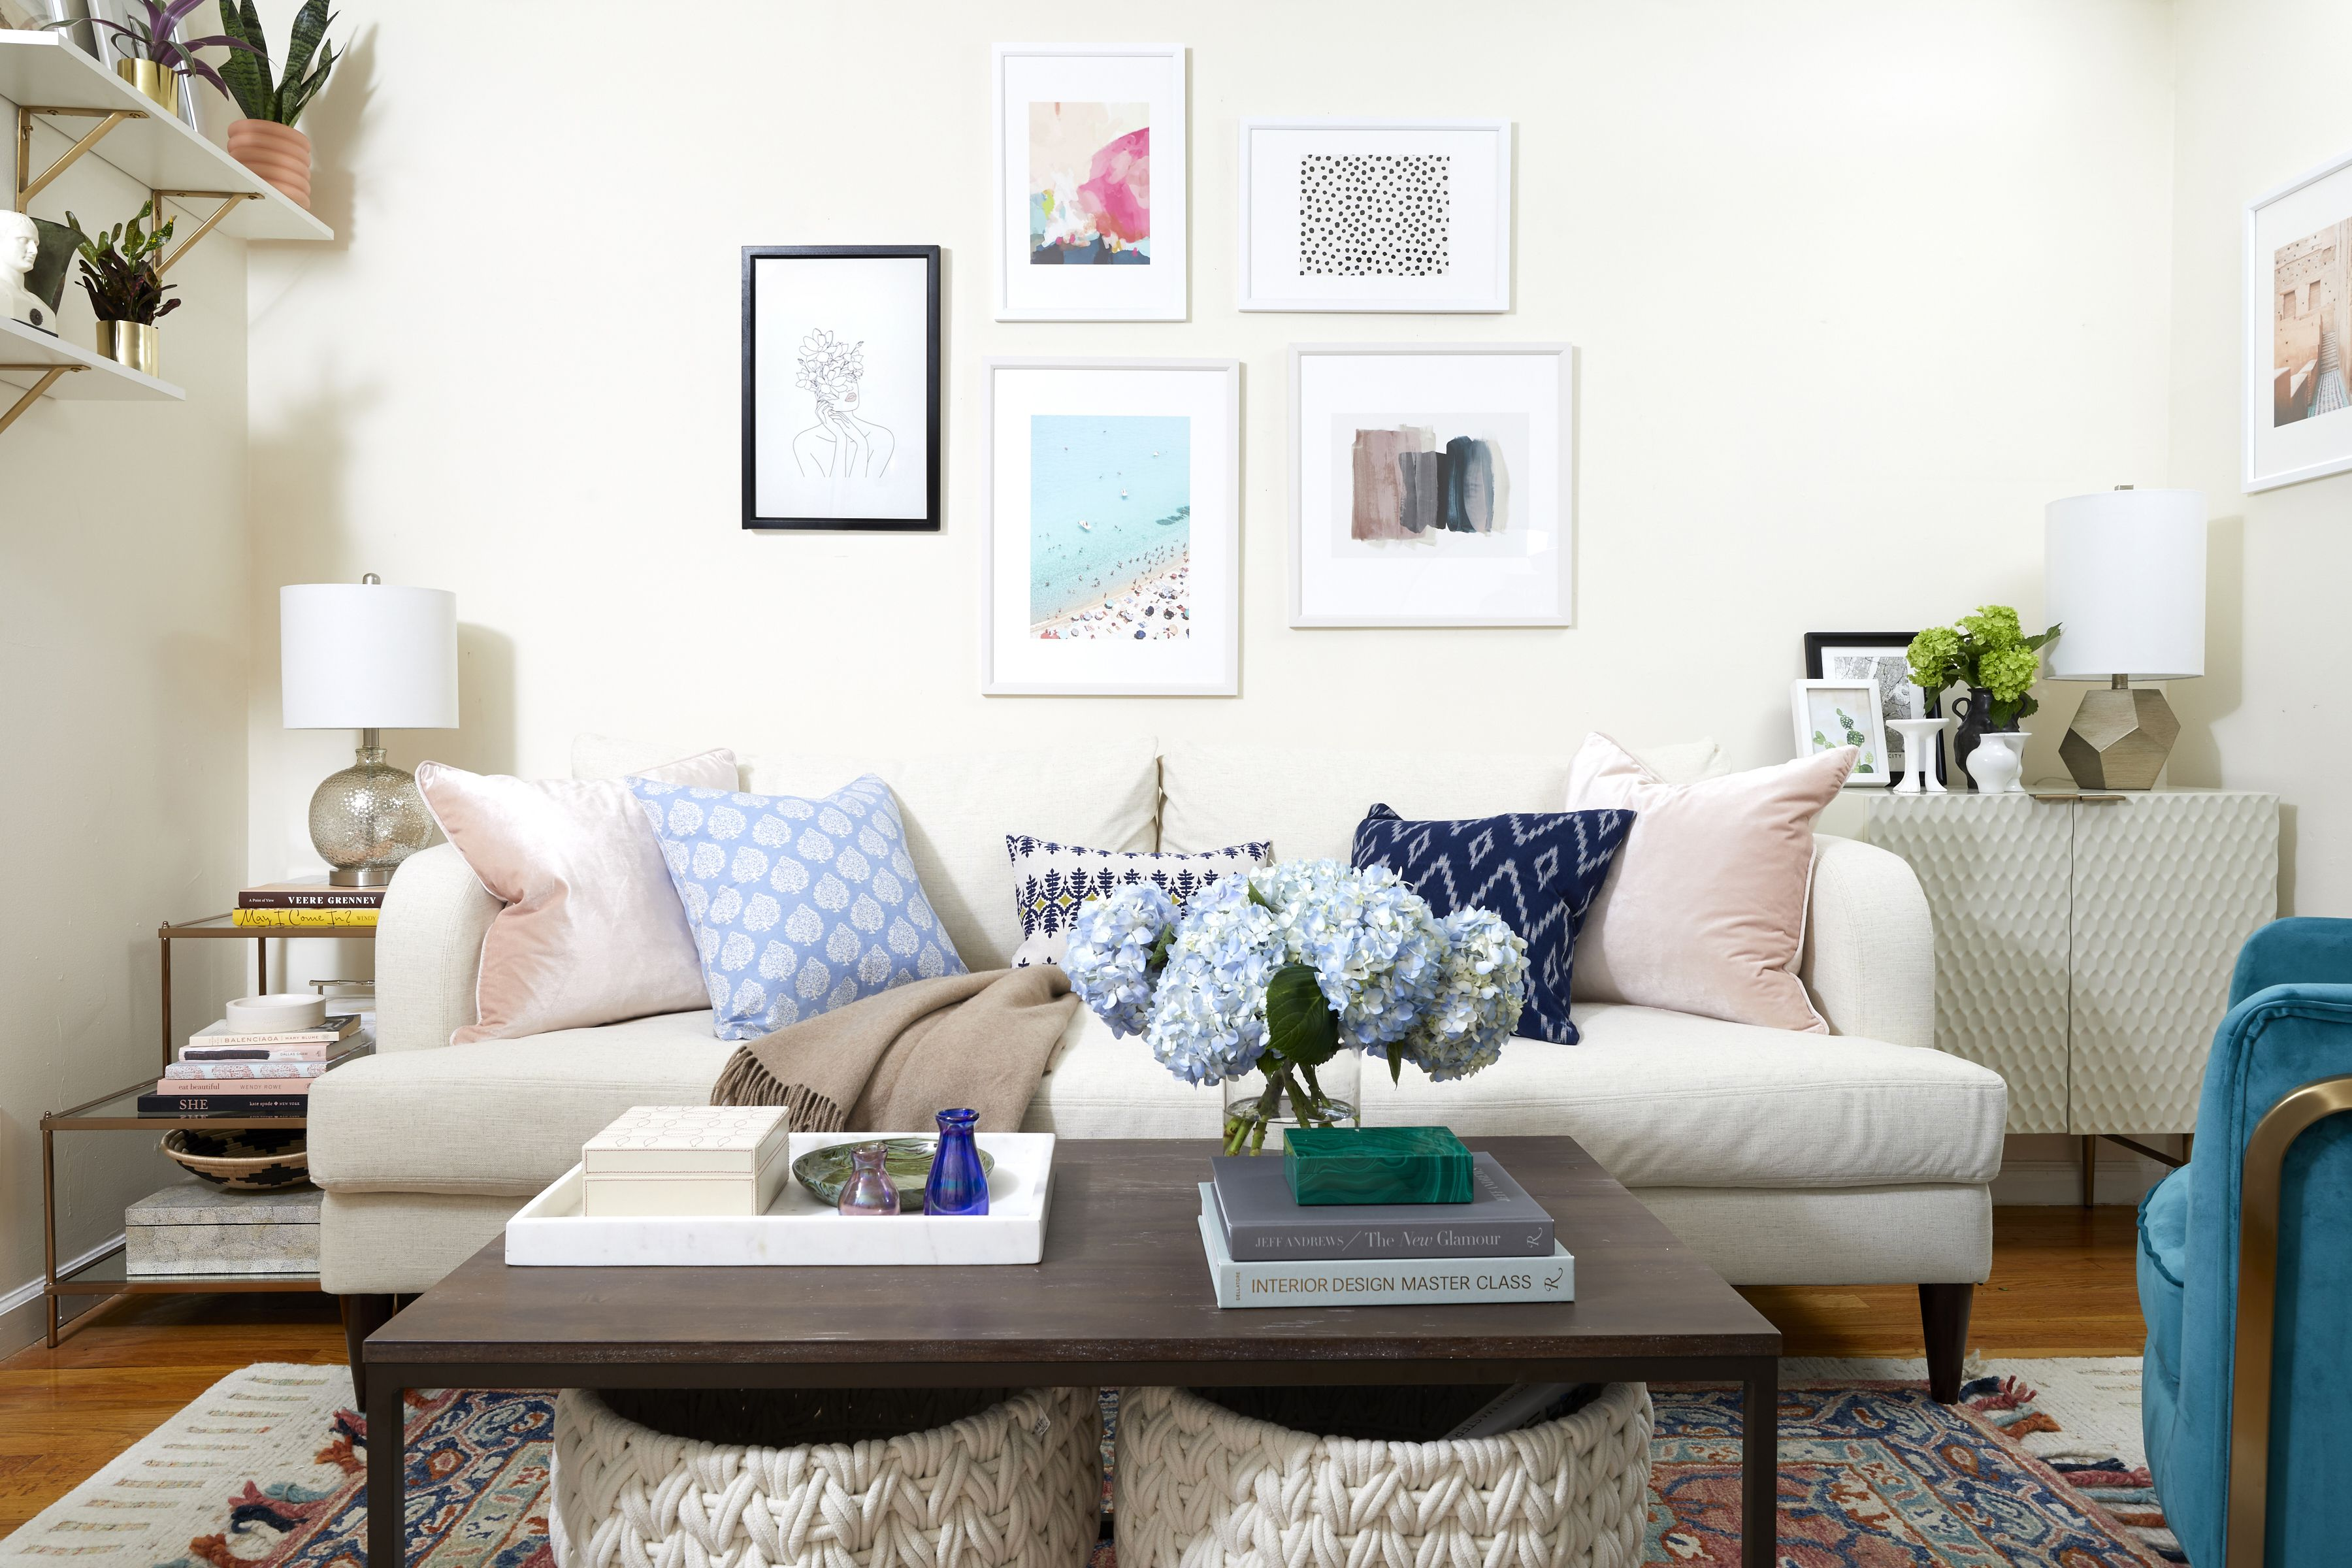 House Beautiful & 6 Tricks to Make a Dark Room Feel Bright - Windowless Room Ideas